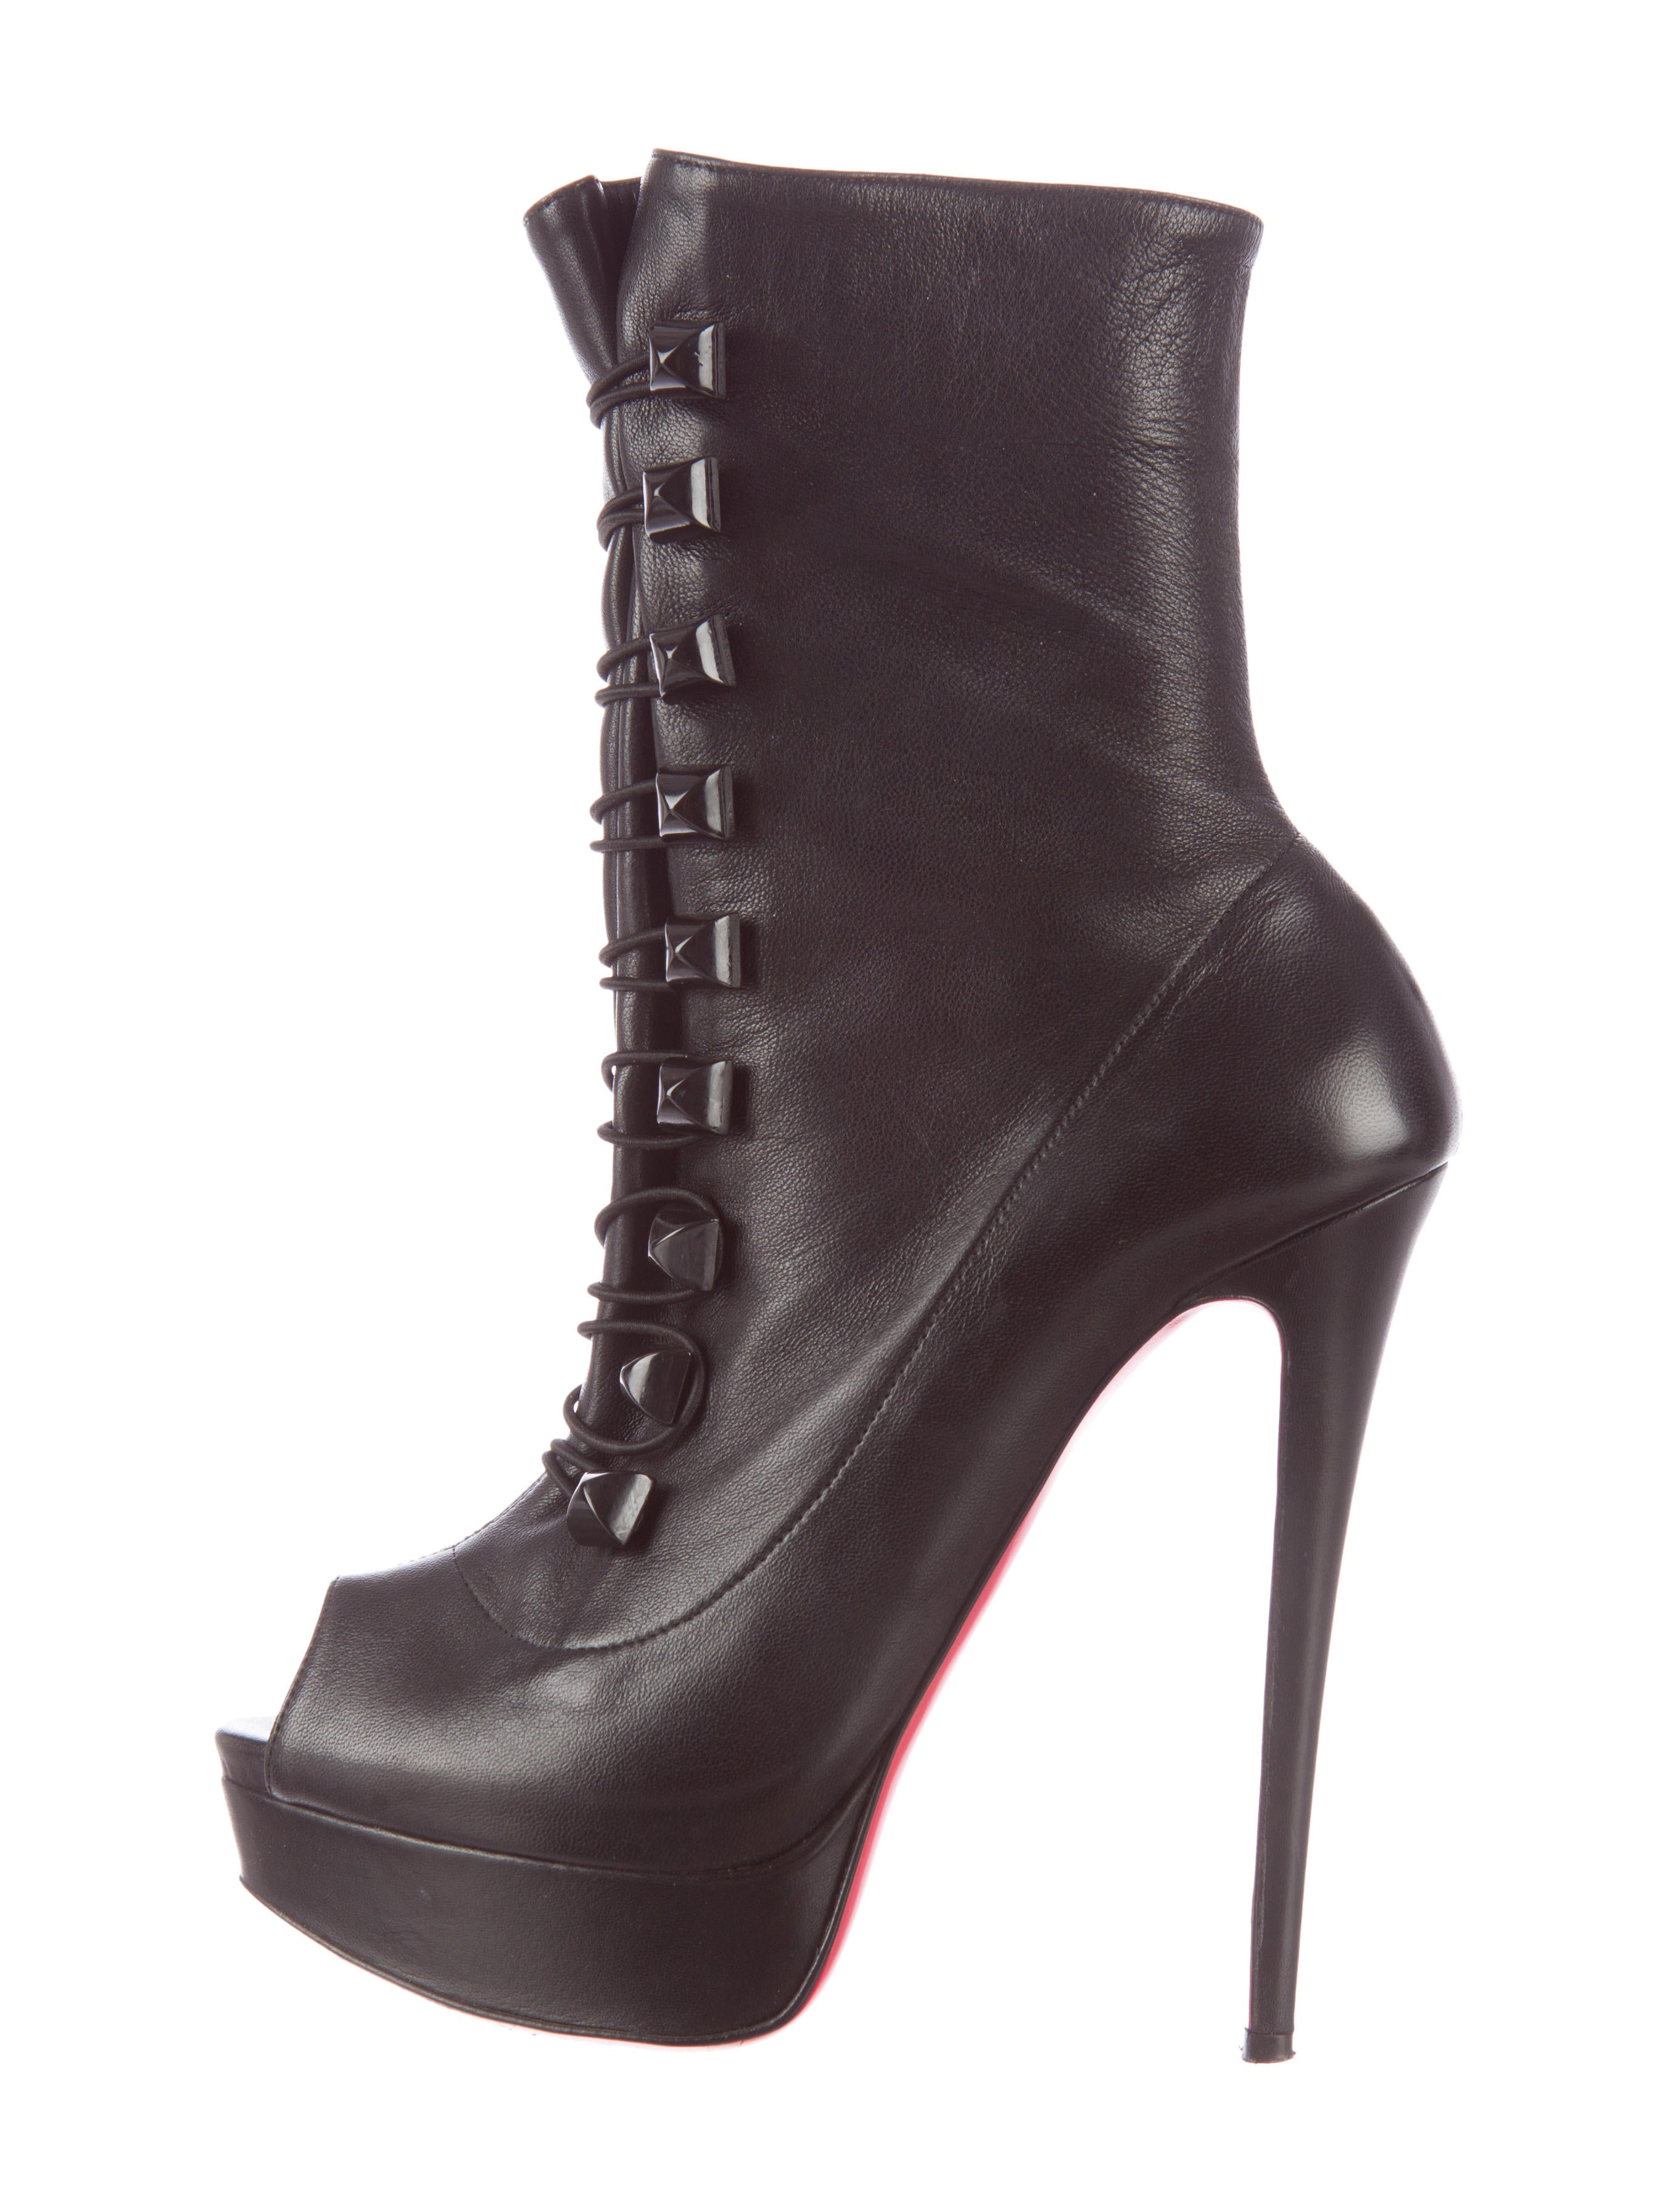 Artesur ? christian louboutin Black leather peep-toe ankle boots ...